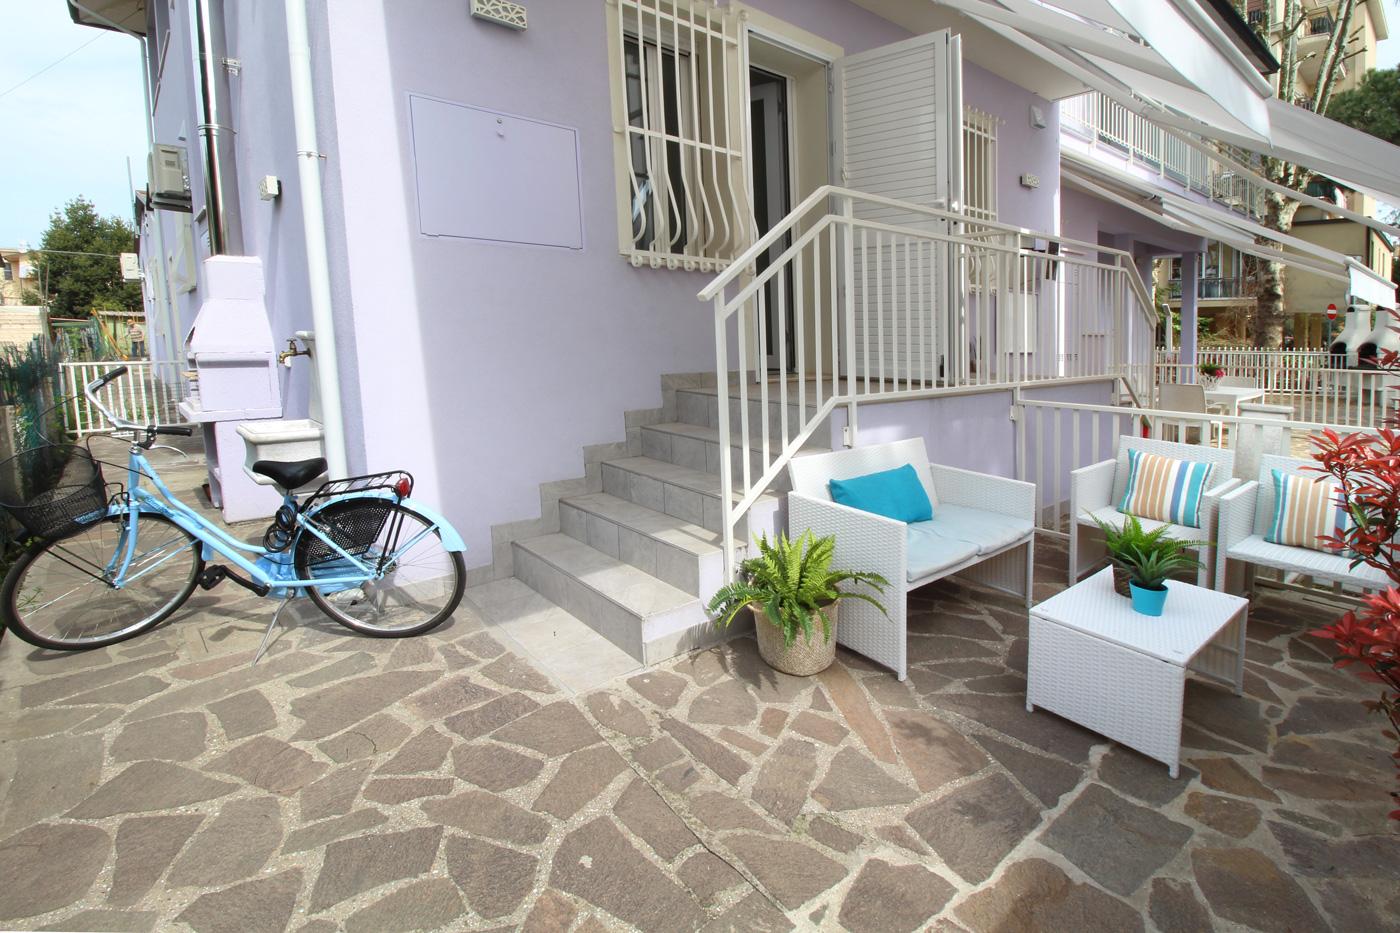 Appartamento Andrea_romagna case vacanze_ IMG_7087